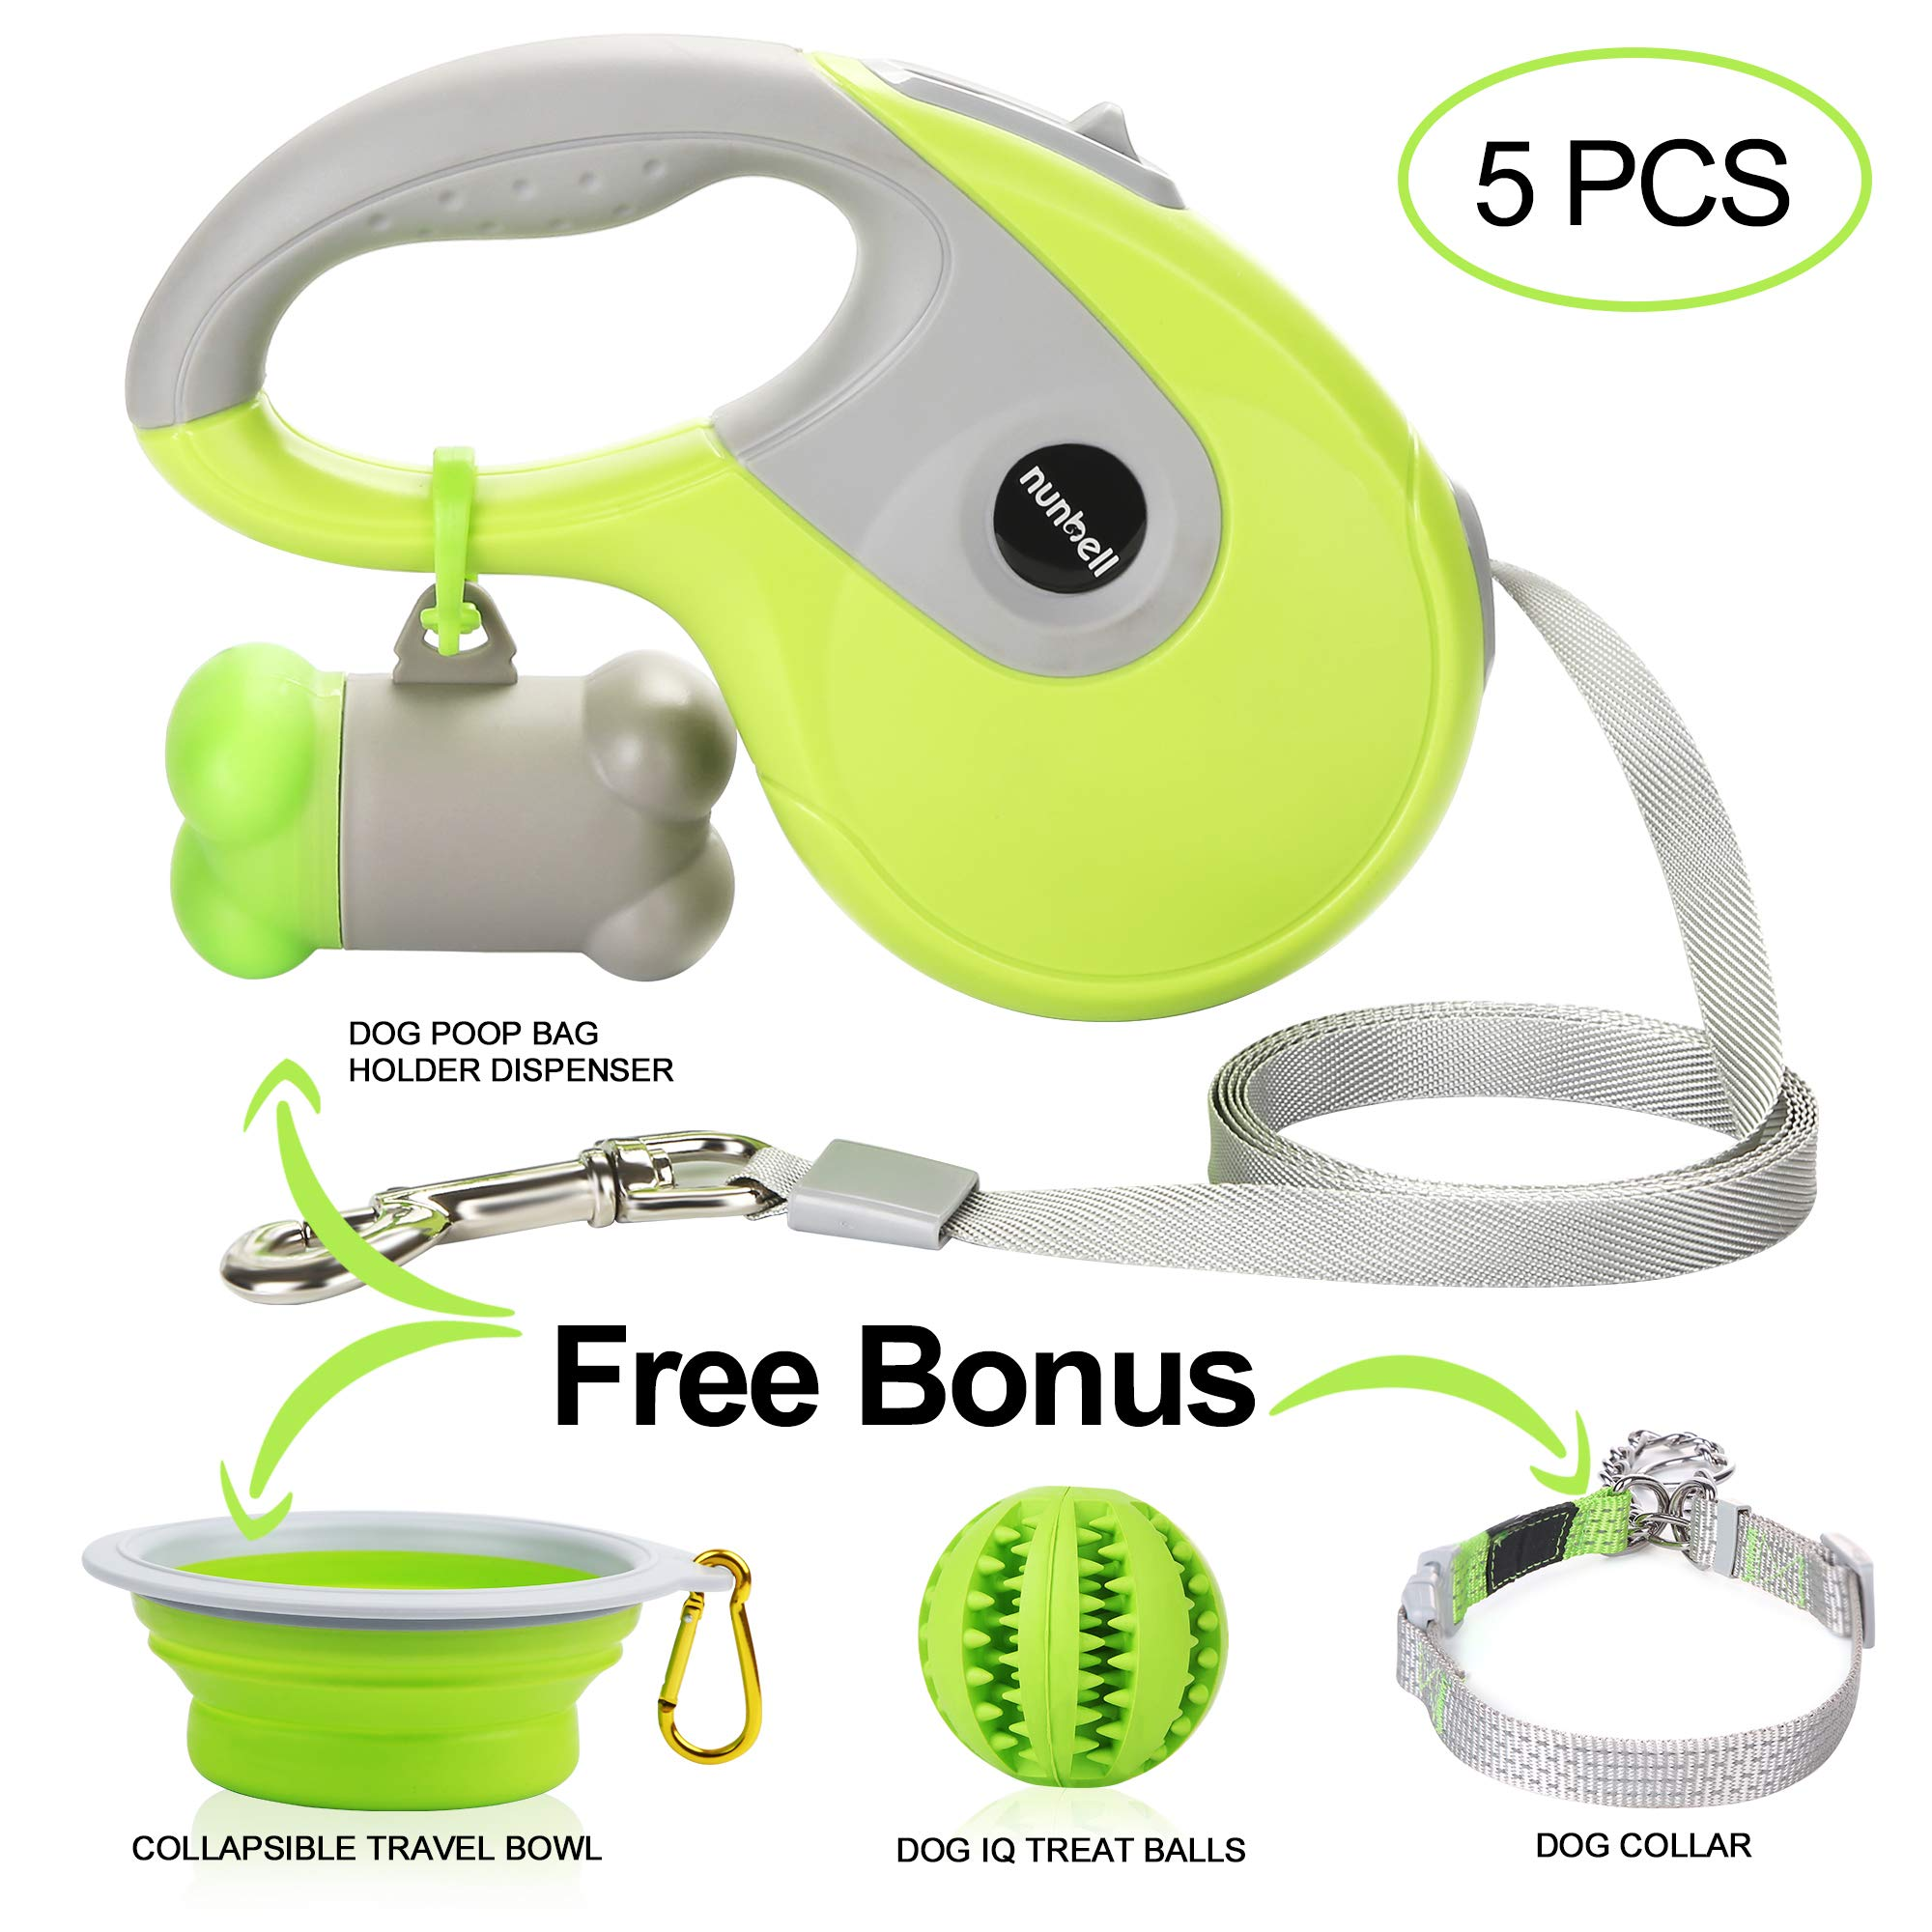 Nunbell Retractable Dog Leash,Heavy Duty 16ft Retracting Pet Leash with Free Bag Dispenser + Bonus Bowl + Dog Collar;Strong & Durable Nylon Tape/Ribbon | Dog IQ Treat Balls | Neon Green